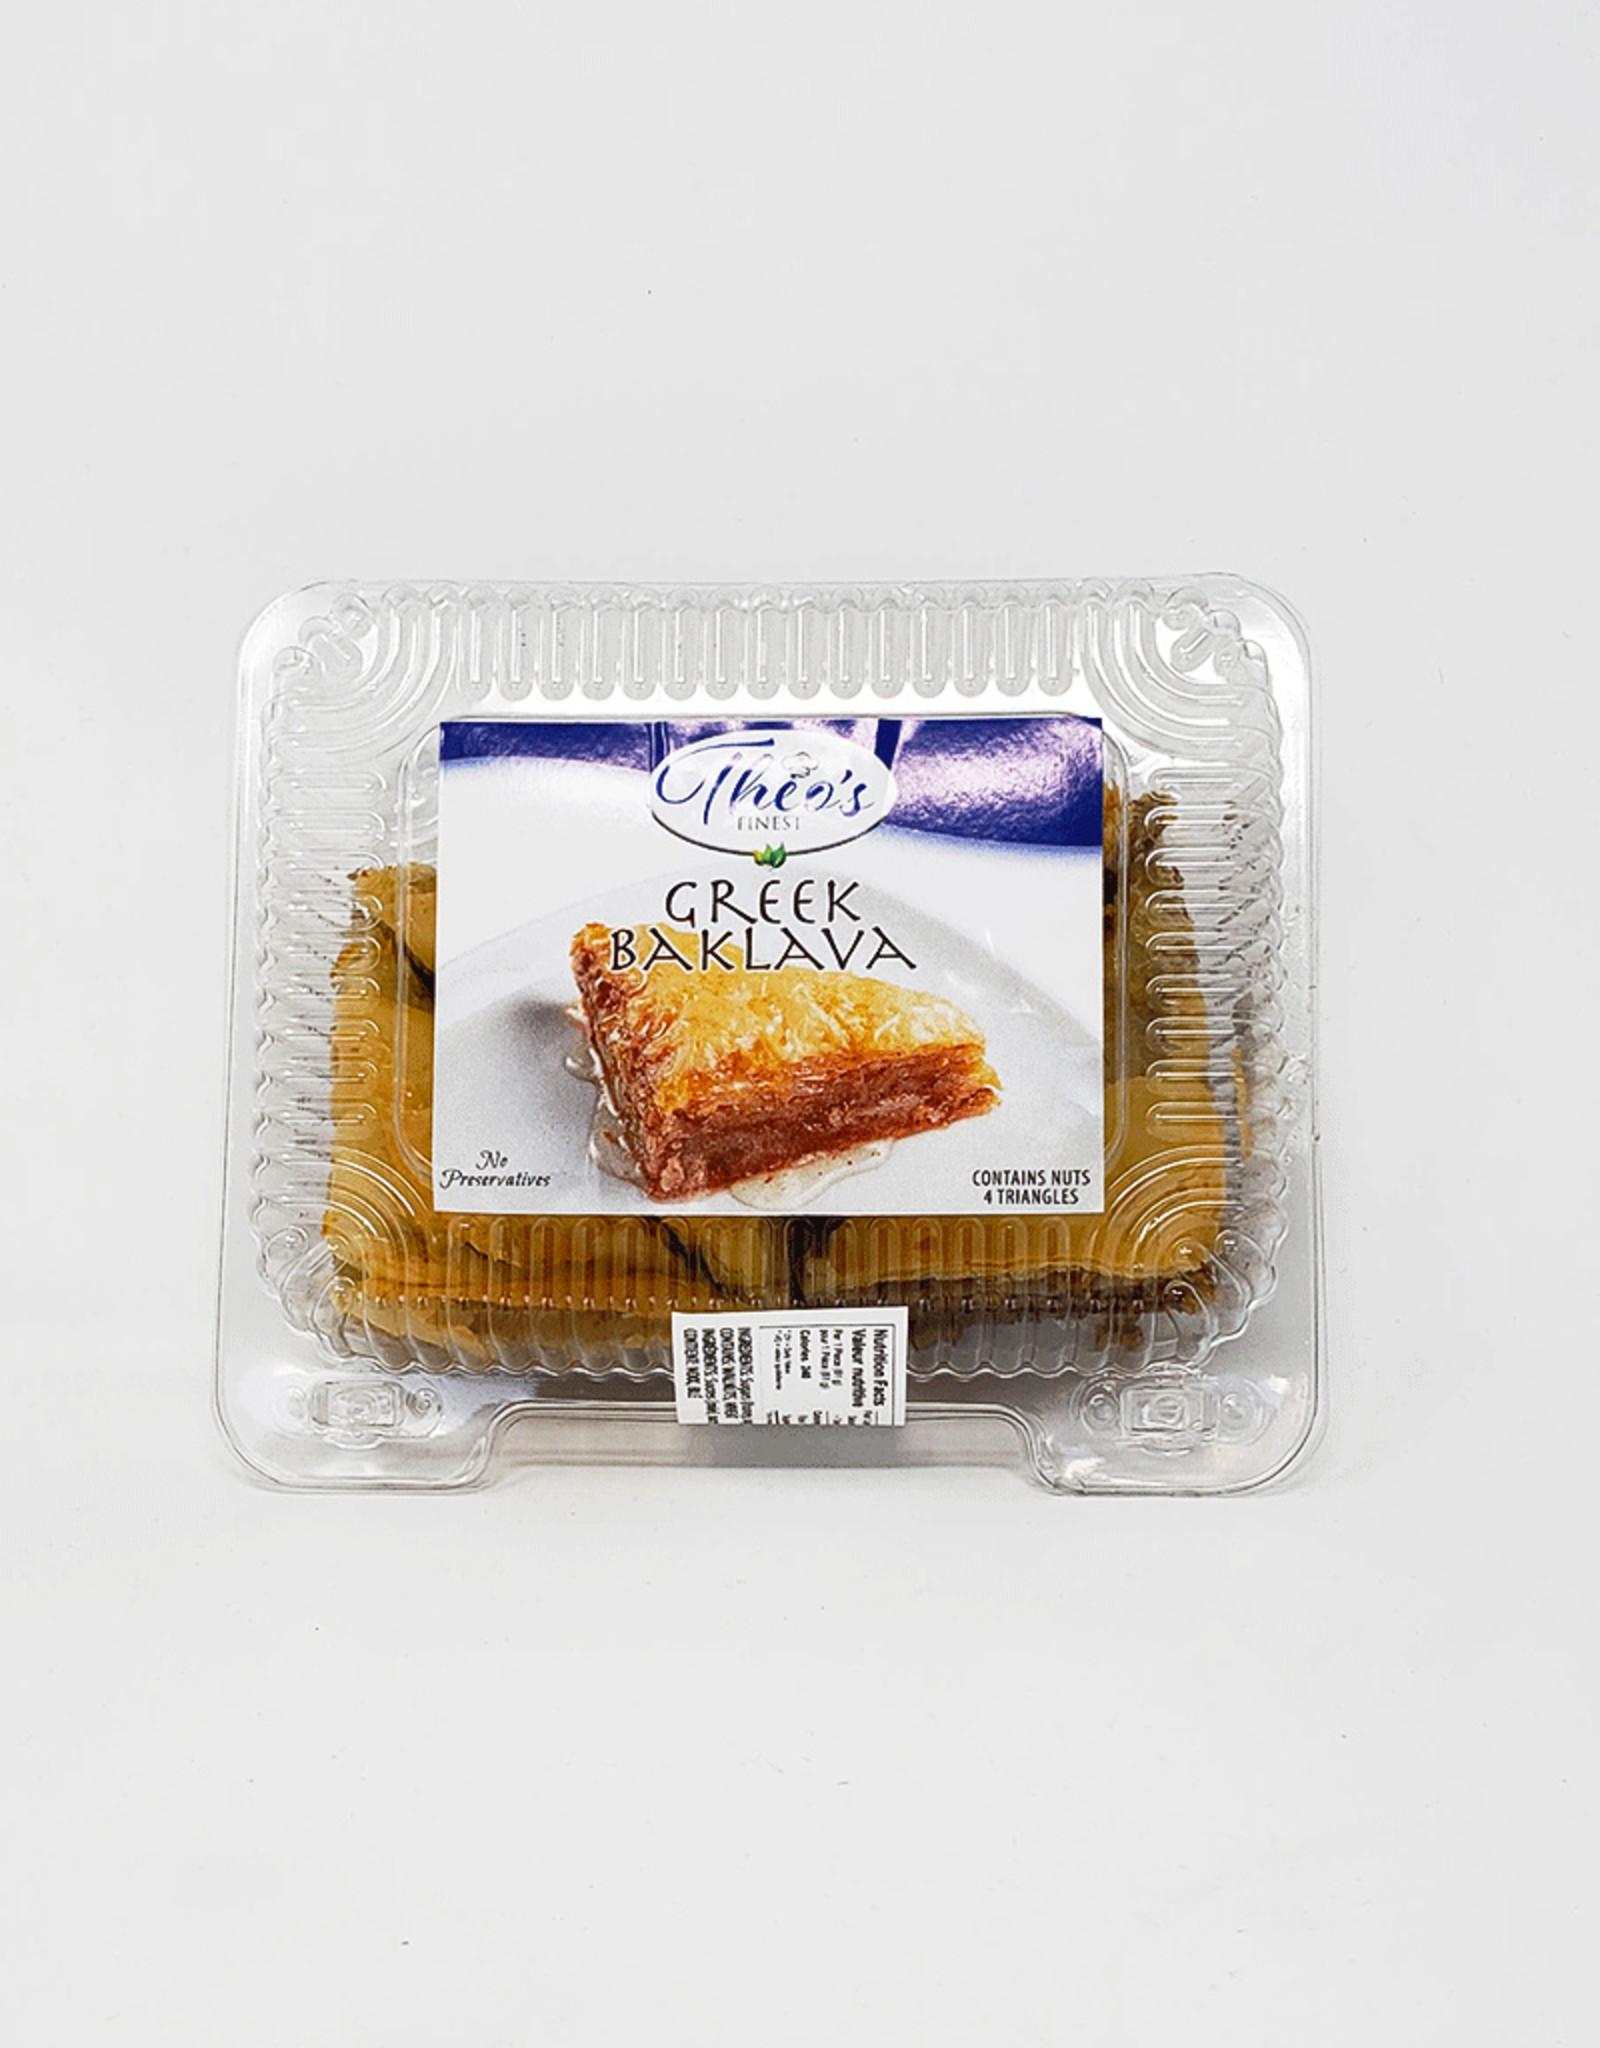 Theo's Fine Foods Theos Fine Foods - Baklava